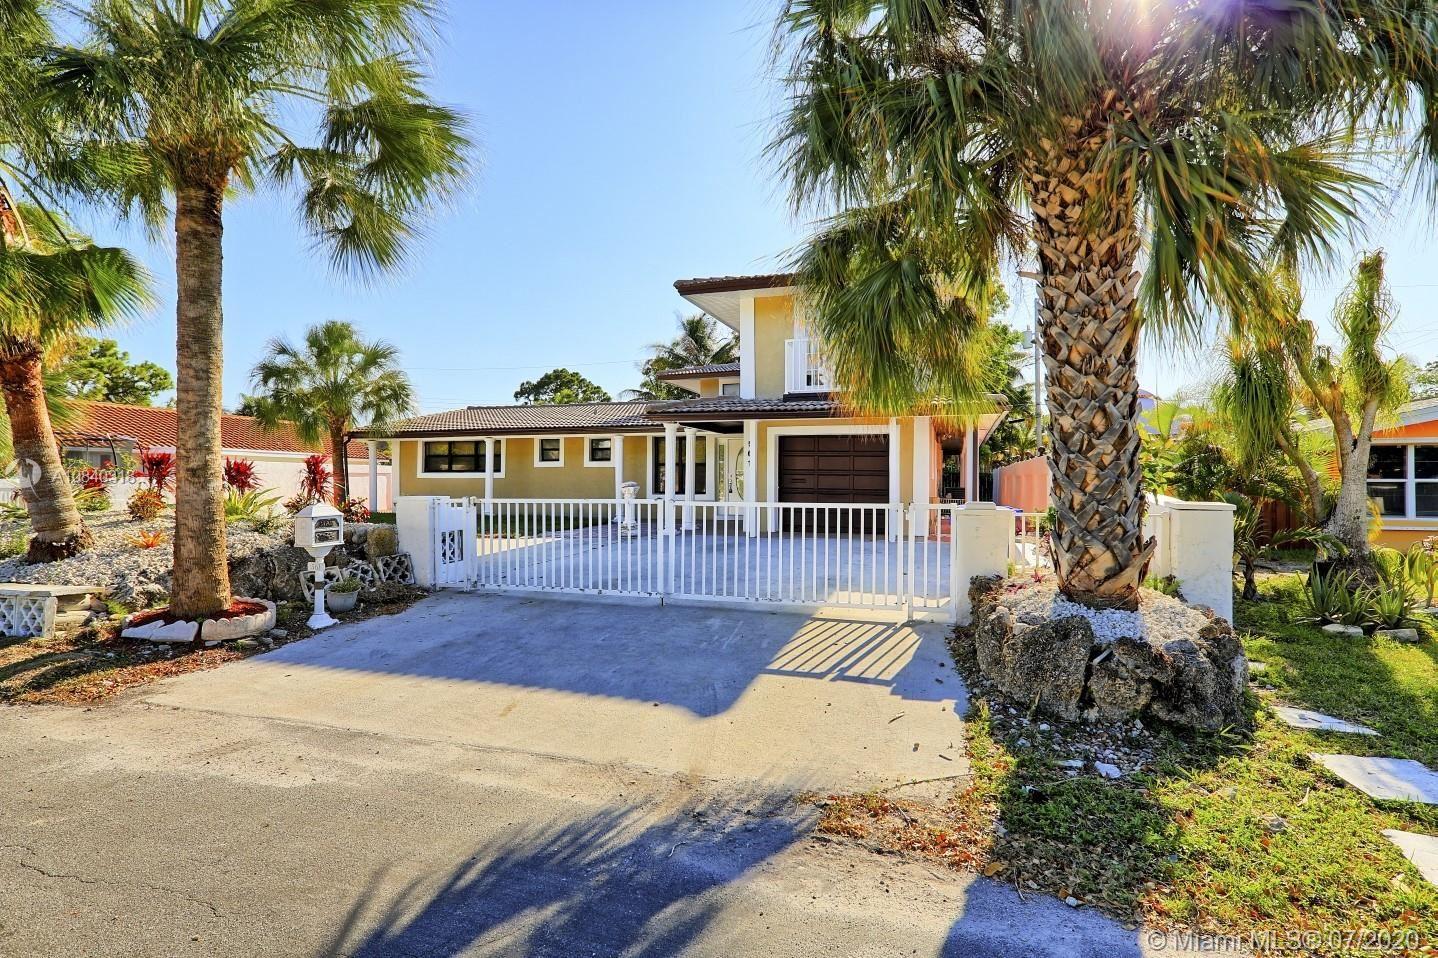 561 SE 3rd Ave., Pompano Beach, FL 33060 - #: A10840318